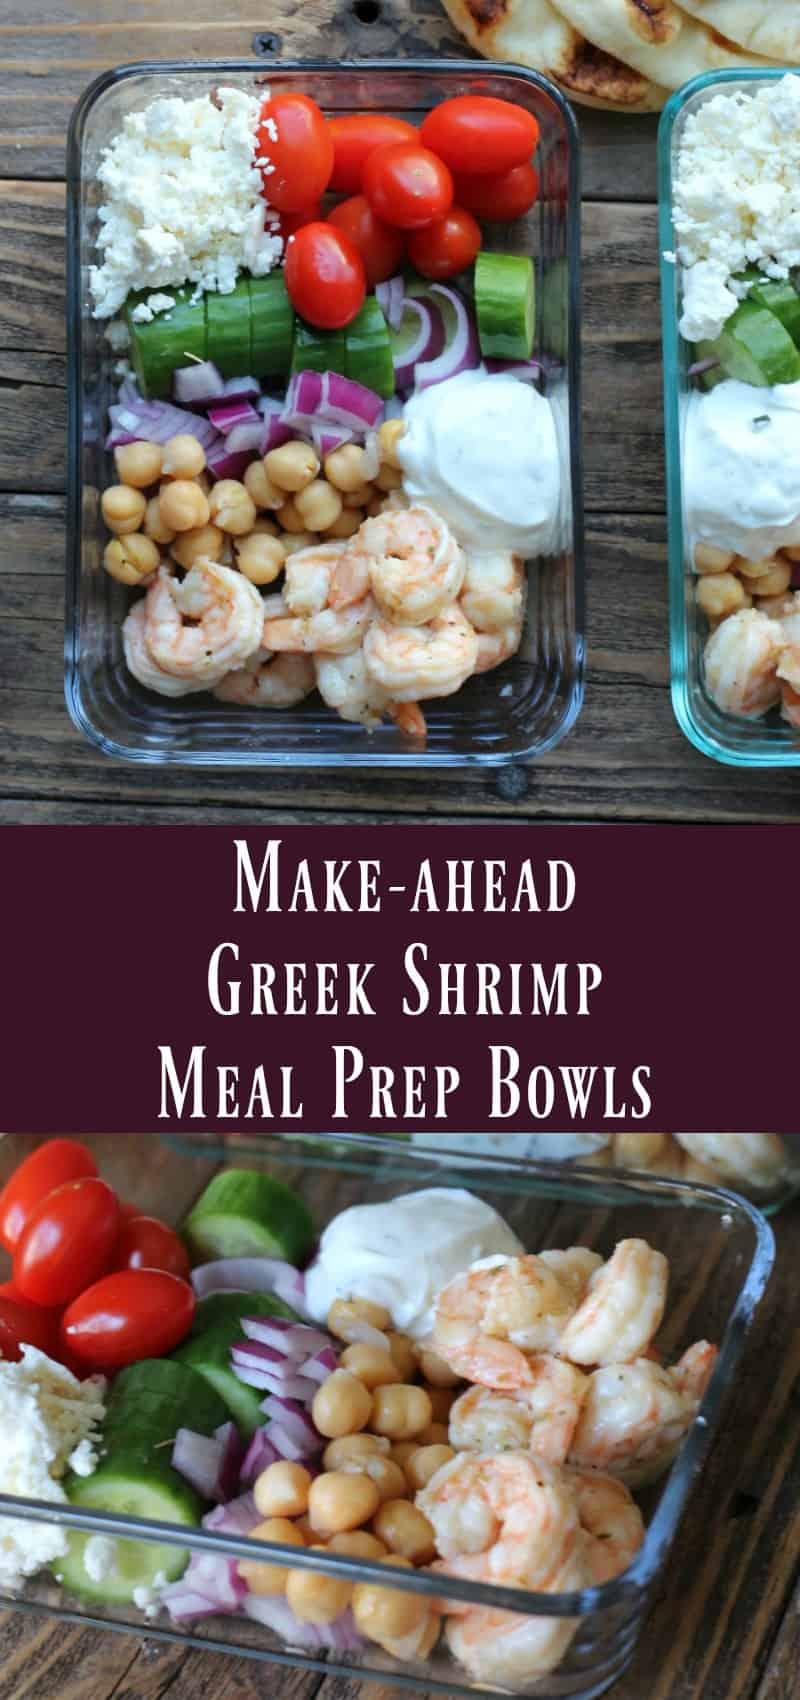 Make-ahead Greek Shrimp Meal Prep Bowls